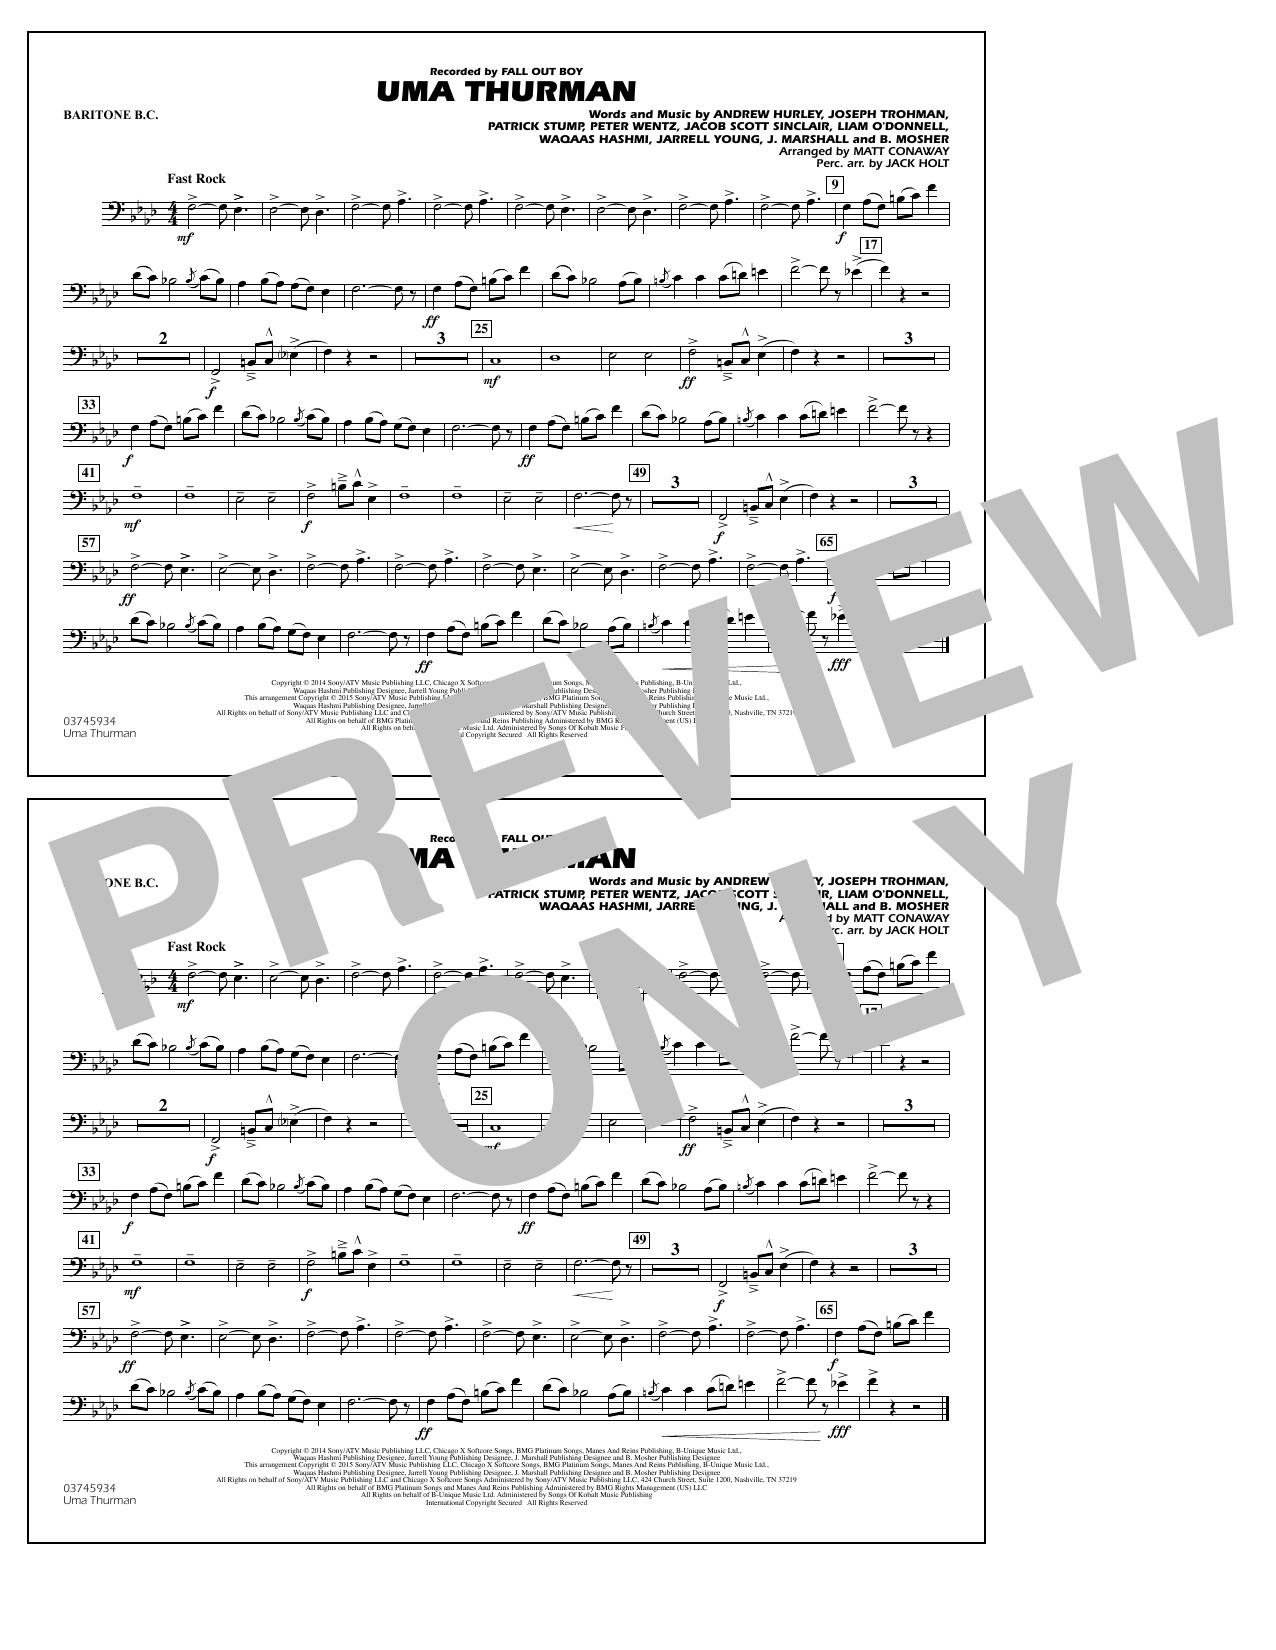 Uma Thurman - Baritone B.C. (Marching Band)